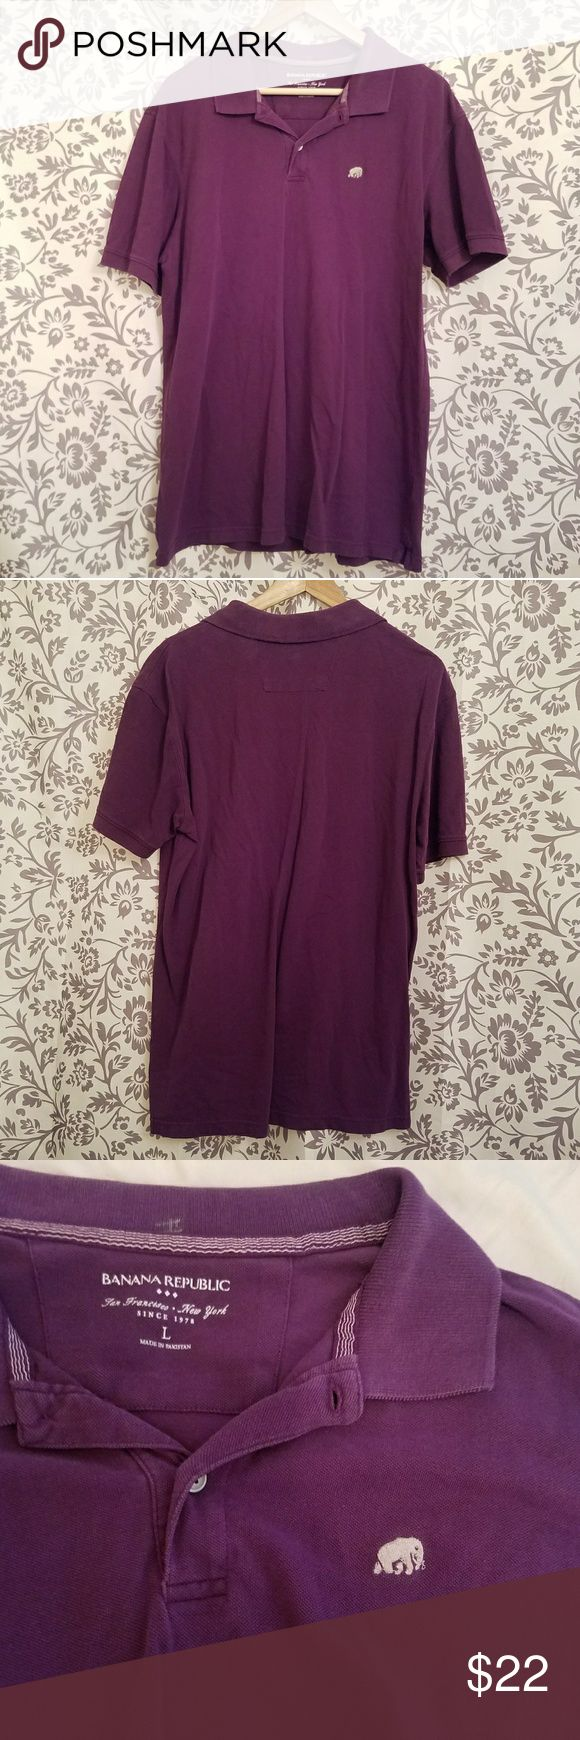 Super cute vivid purple Polo shirt 💜 Adorable Banana Republic purple Polo, 100% cotton, size L.  This colour would look great on anyone!  namasteツ Banana Republic Shirts Polos